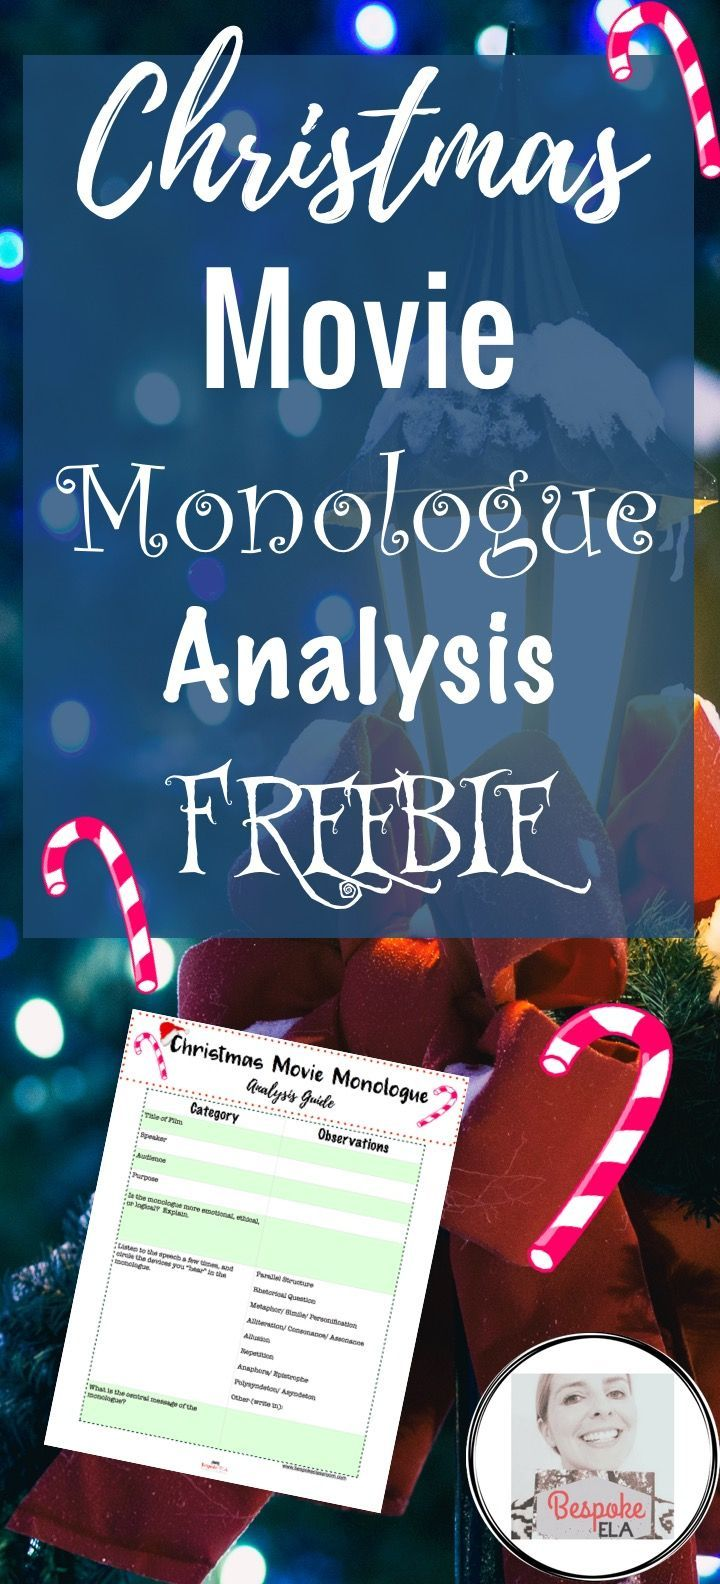 This freebie by Bespoke ELA accompanies a blog article to analyze ...